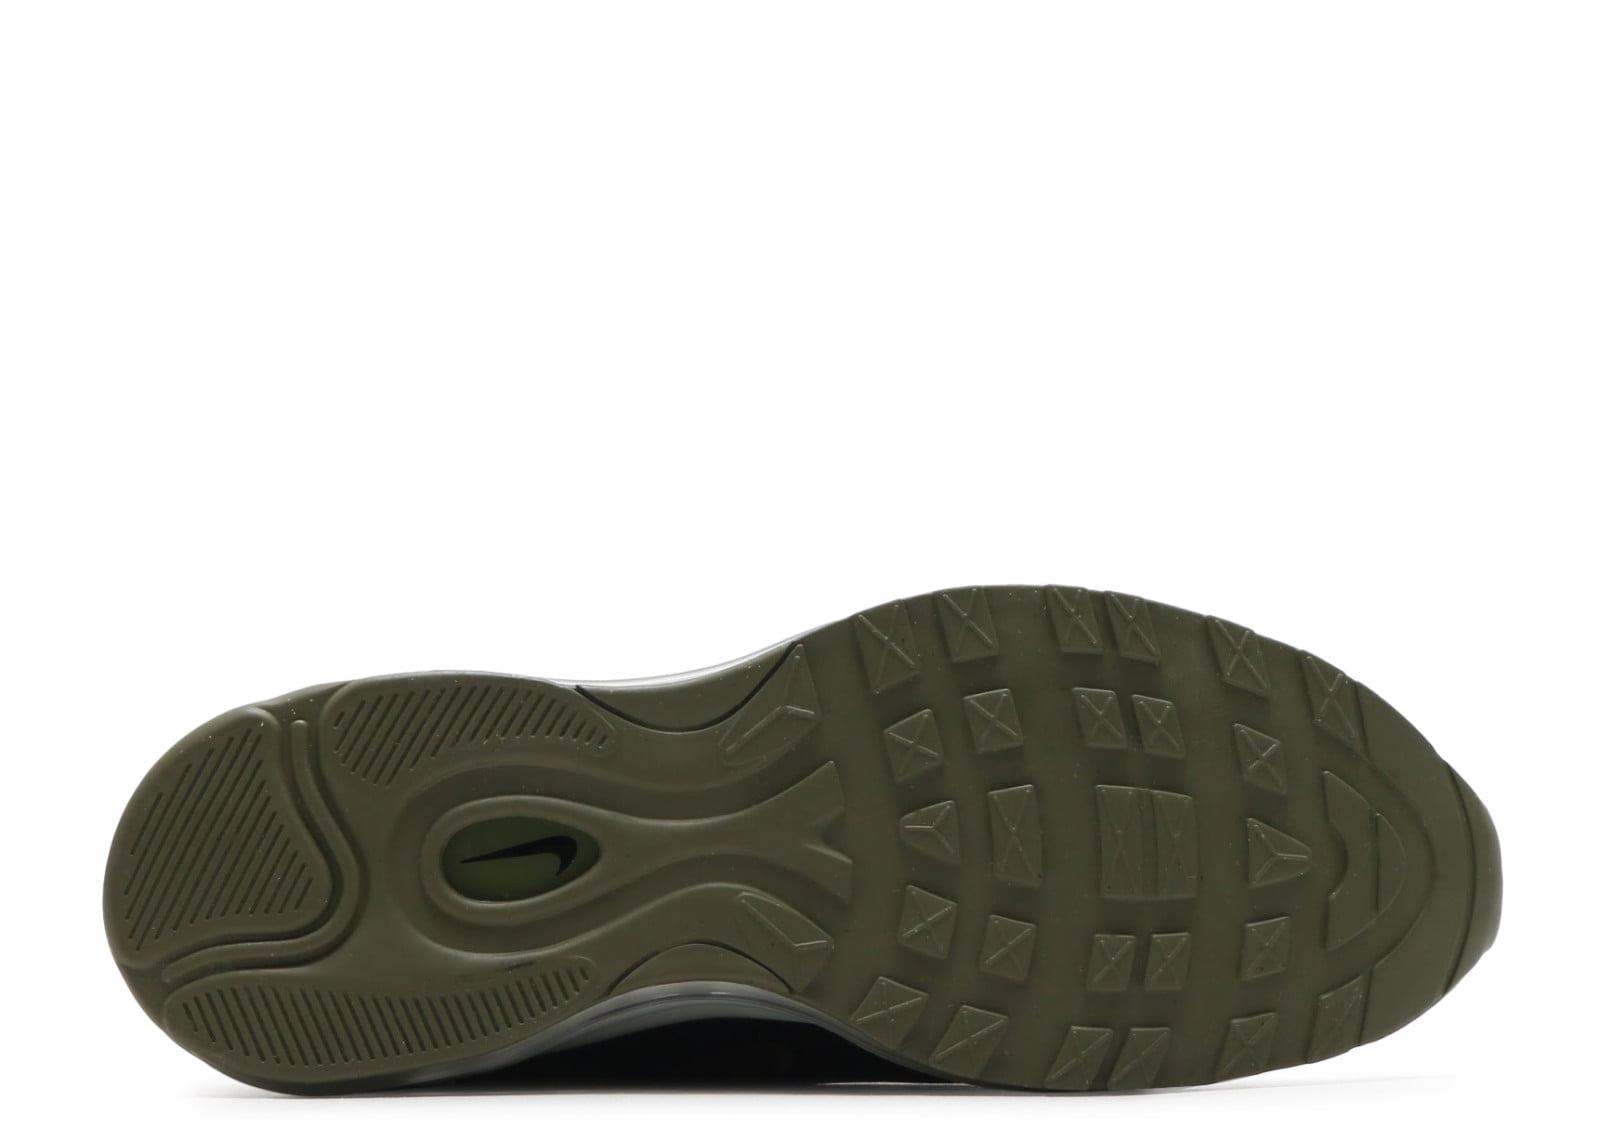 Nike Mens Air Max 97 UL '17 Fashion Sneakers